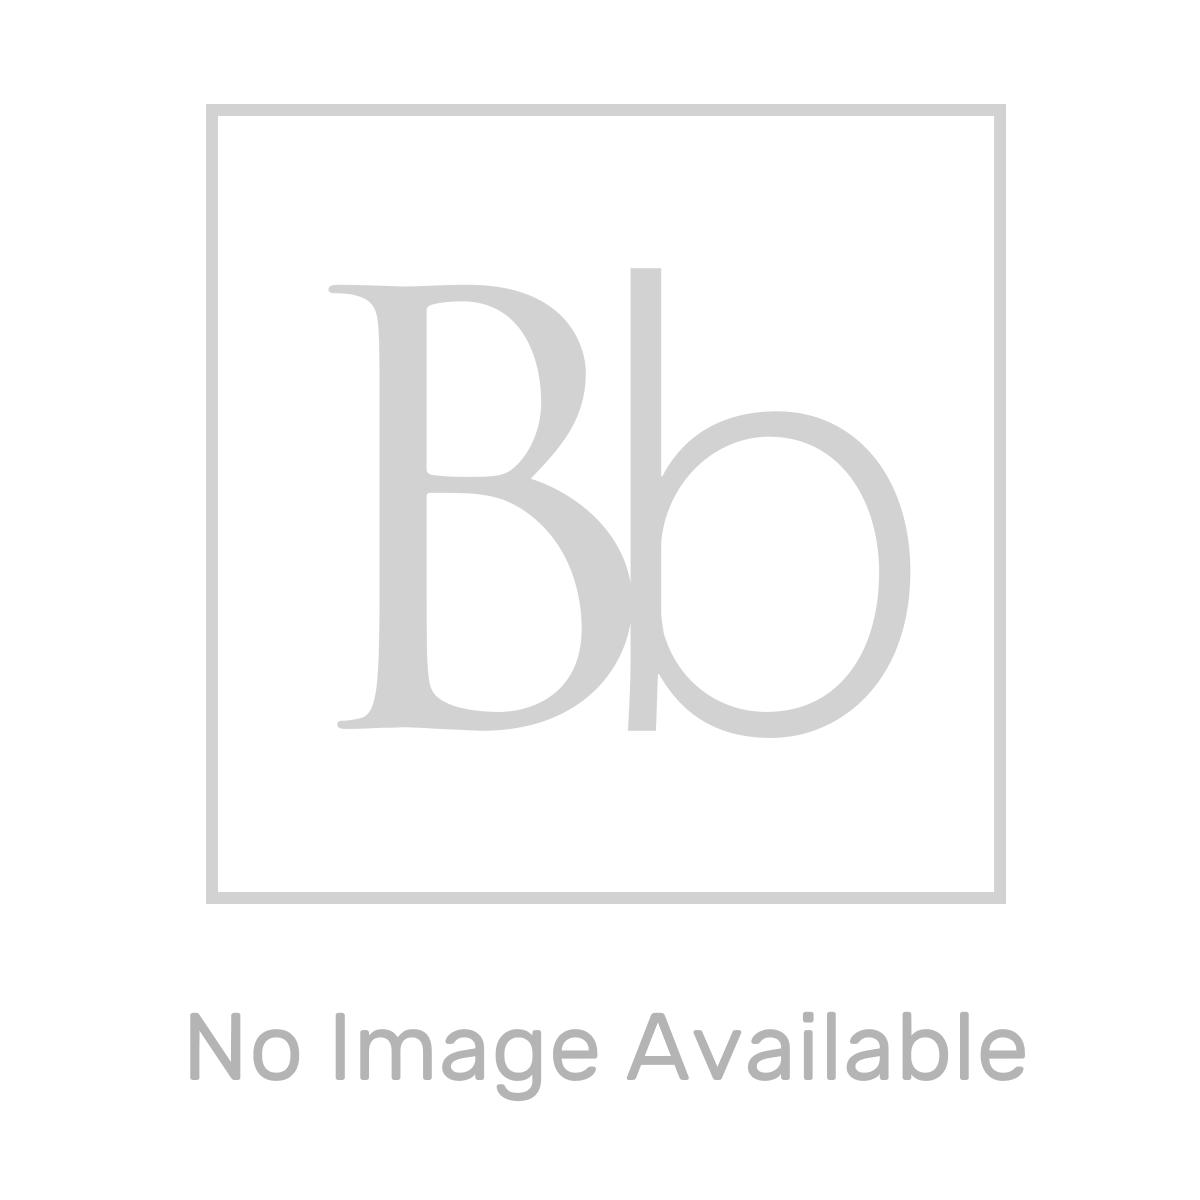 RAK Prima Tech Freestanding Shower Bath Mixer Tap